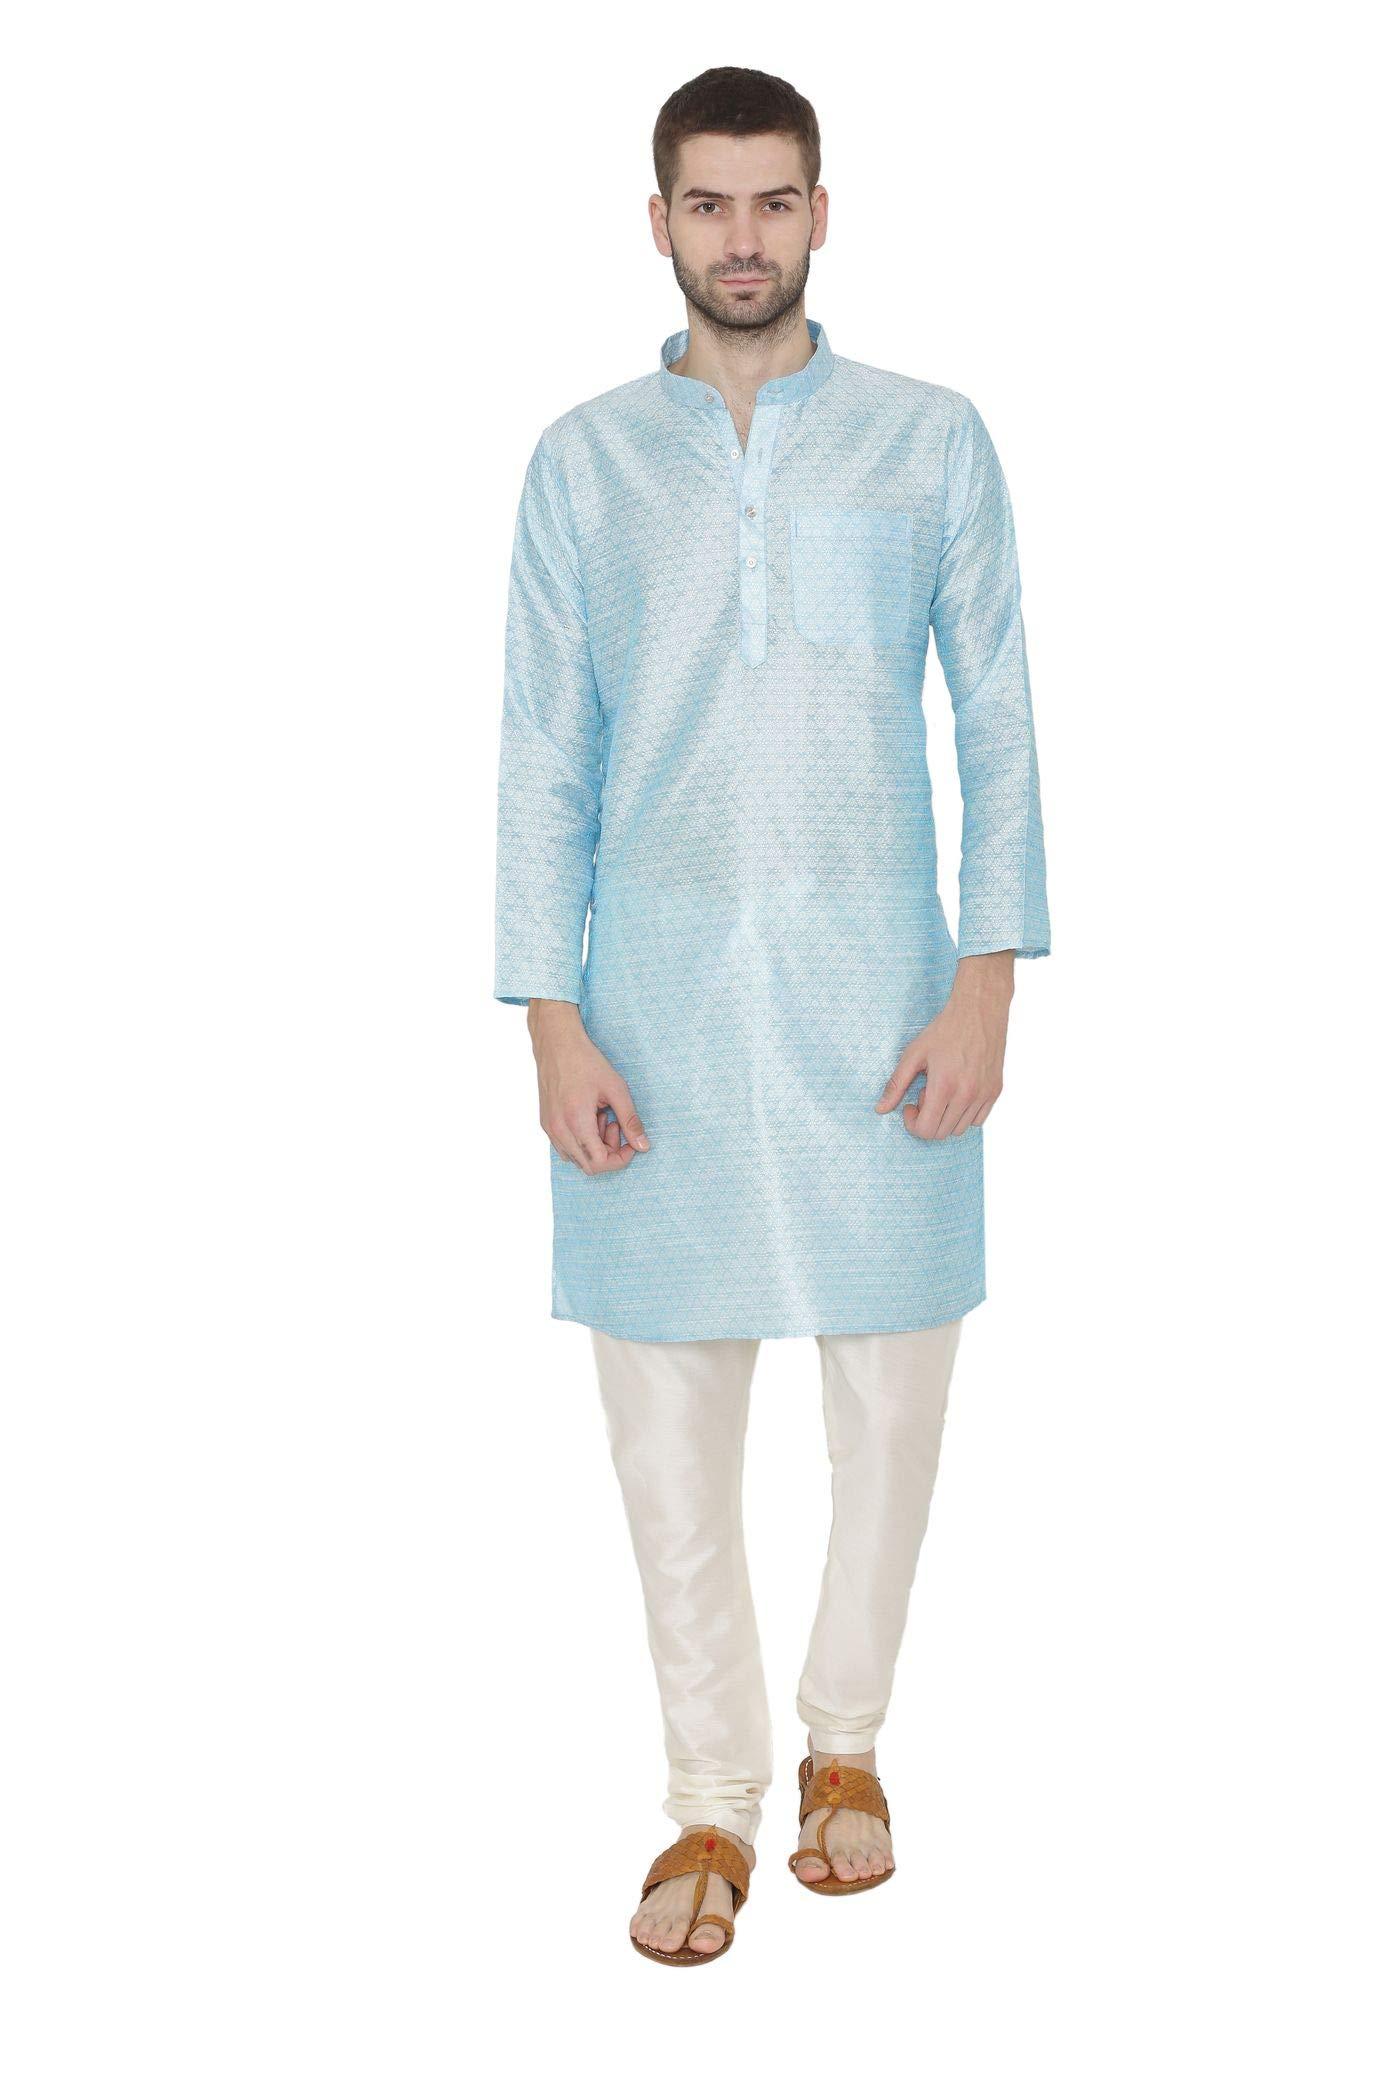 WINTAGE Men's Banarsi Art Silk Tailored Fit Festive Casual Kurta Chudidar Pajama Pyjama - Sky Blue / 4XL